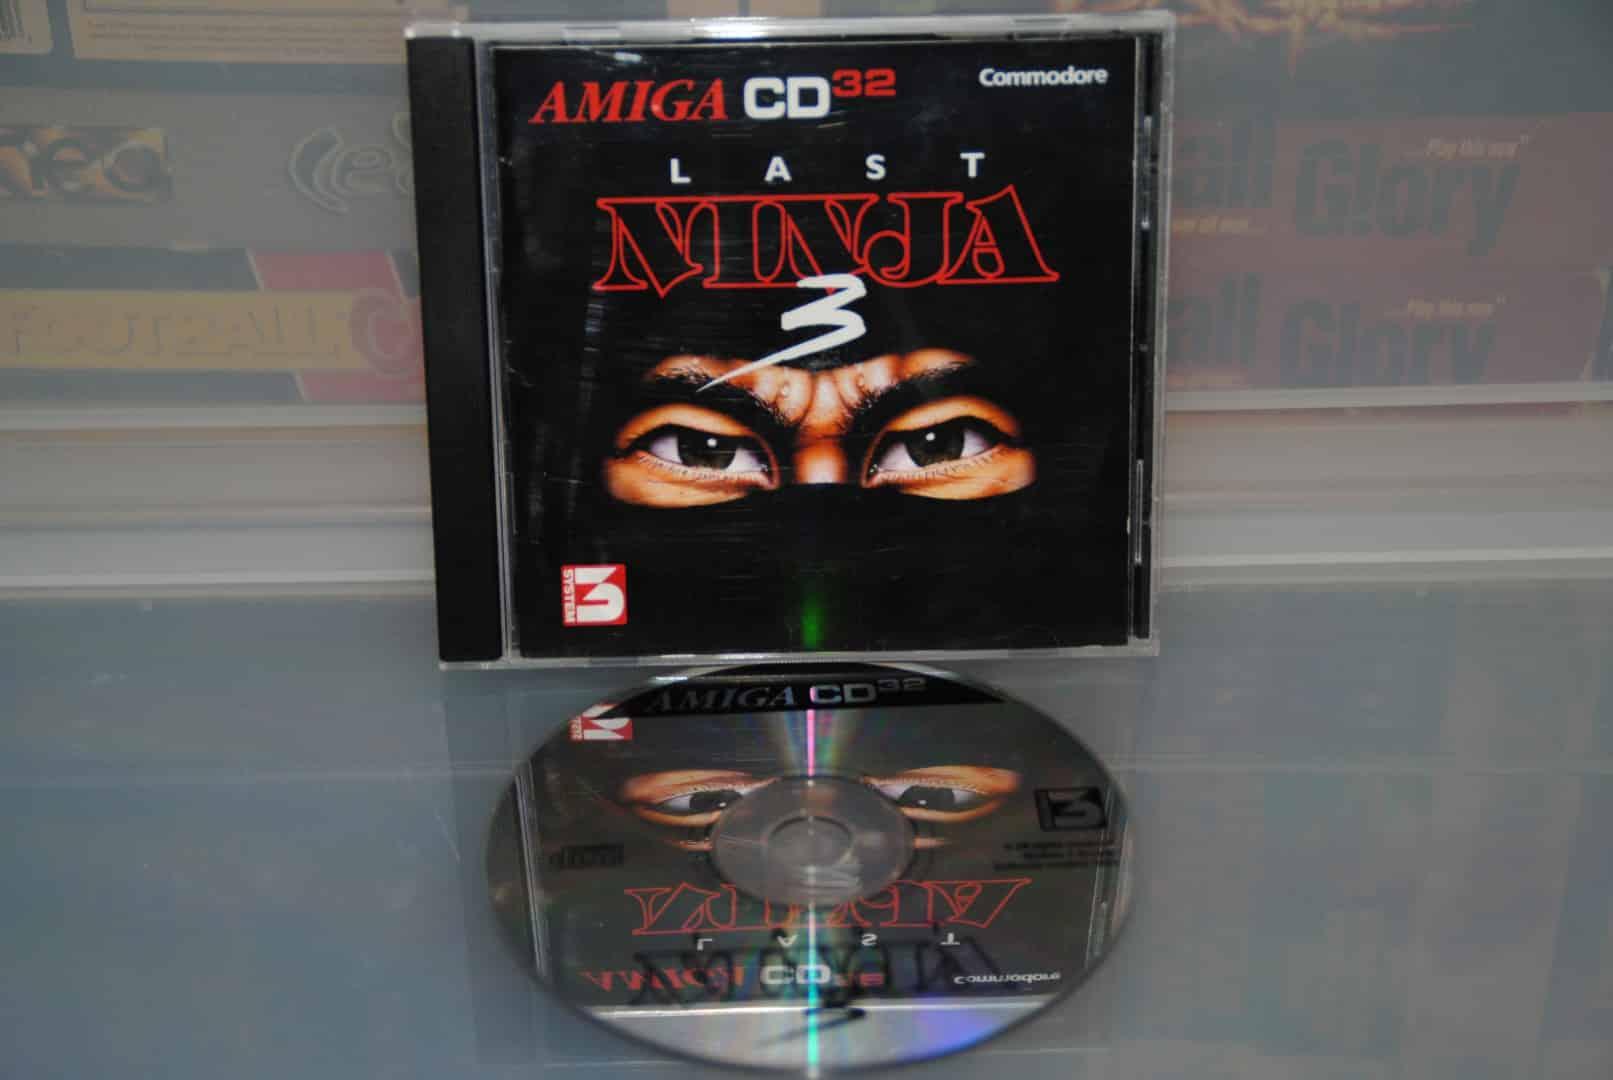 Last Ninja 3 CD32 Front + CD